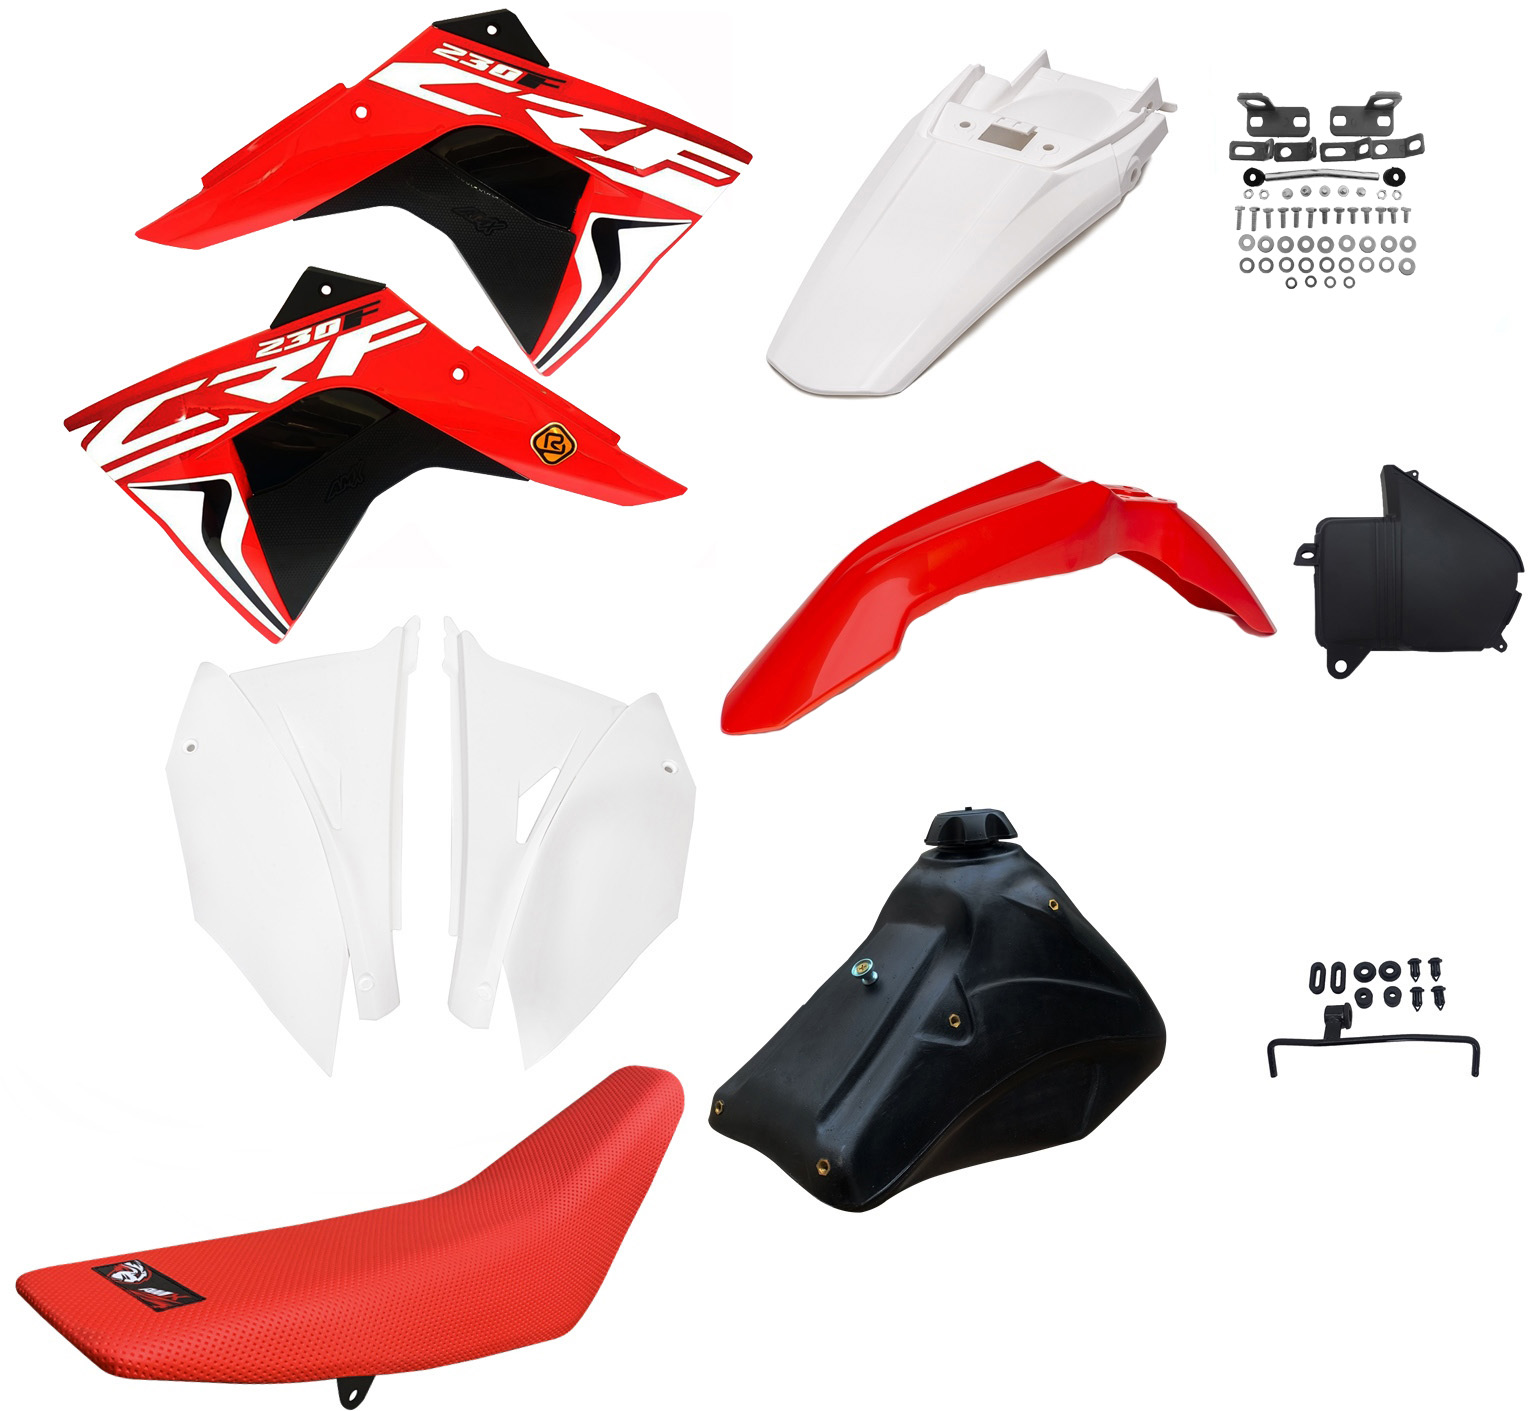 Kit Plástico Amx Adaptável C/ Adesivo Crf 230 P/ Xr 200/250 Bros 125/150